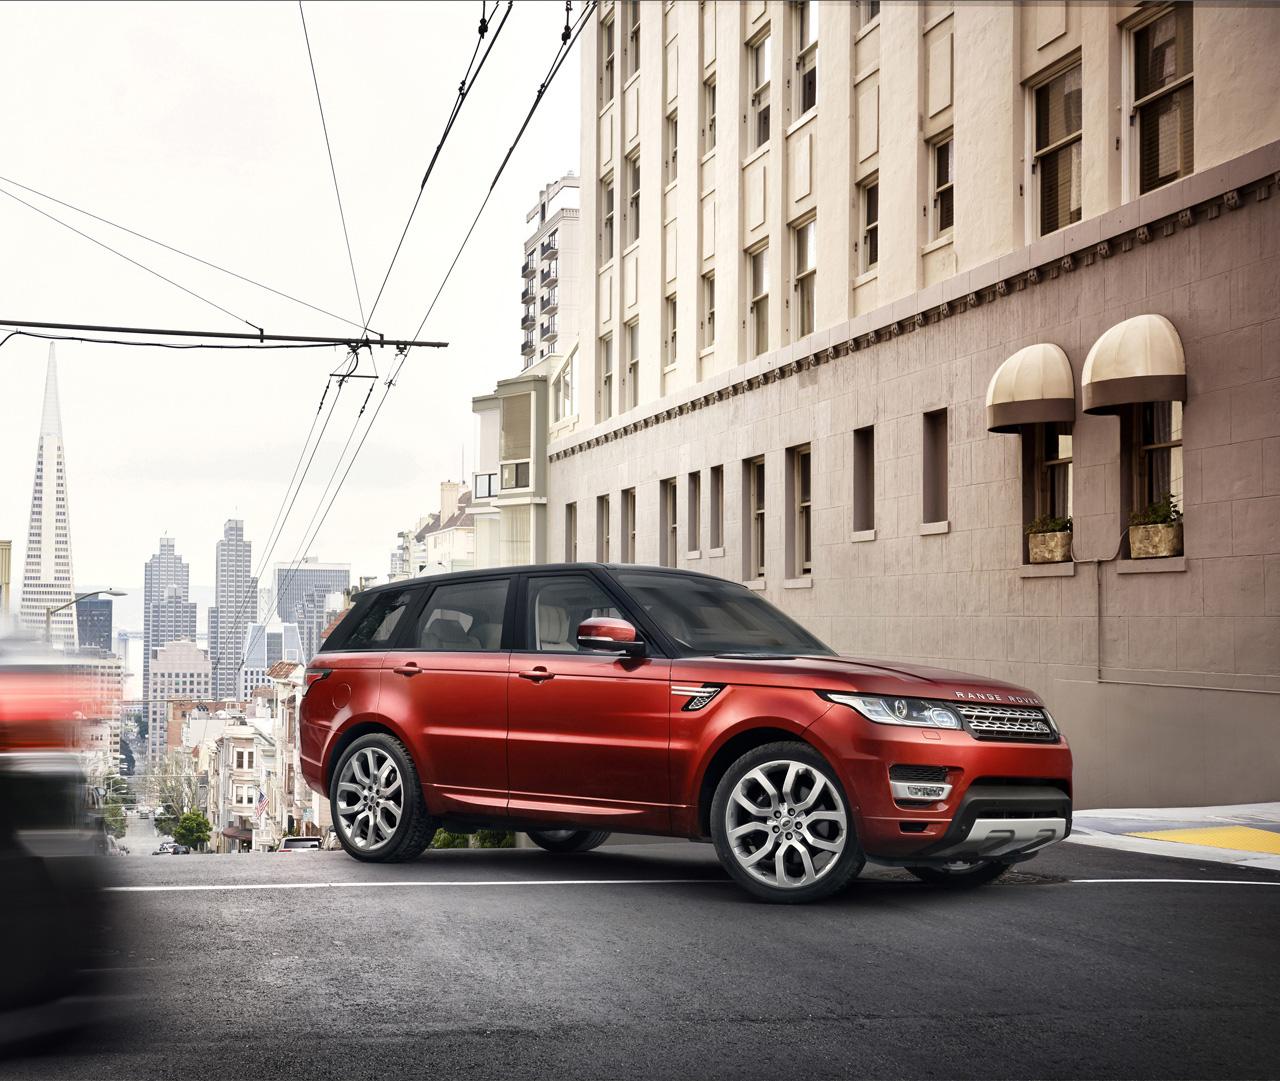 Land Rover Car Wallpaper: 2014 Range Rover Sport Original Pictures